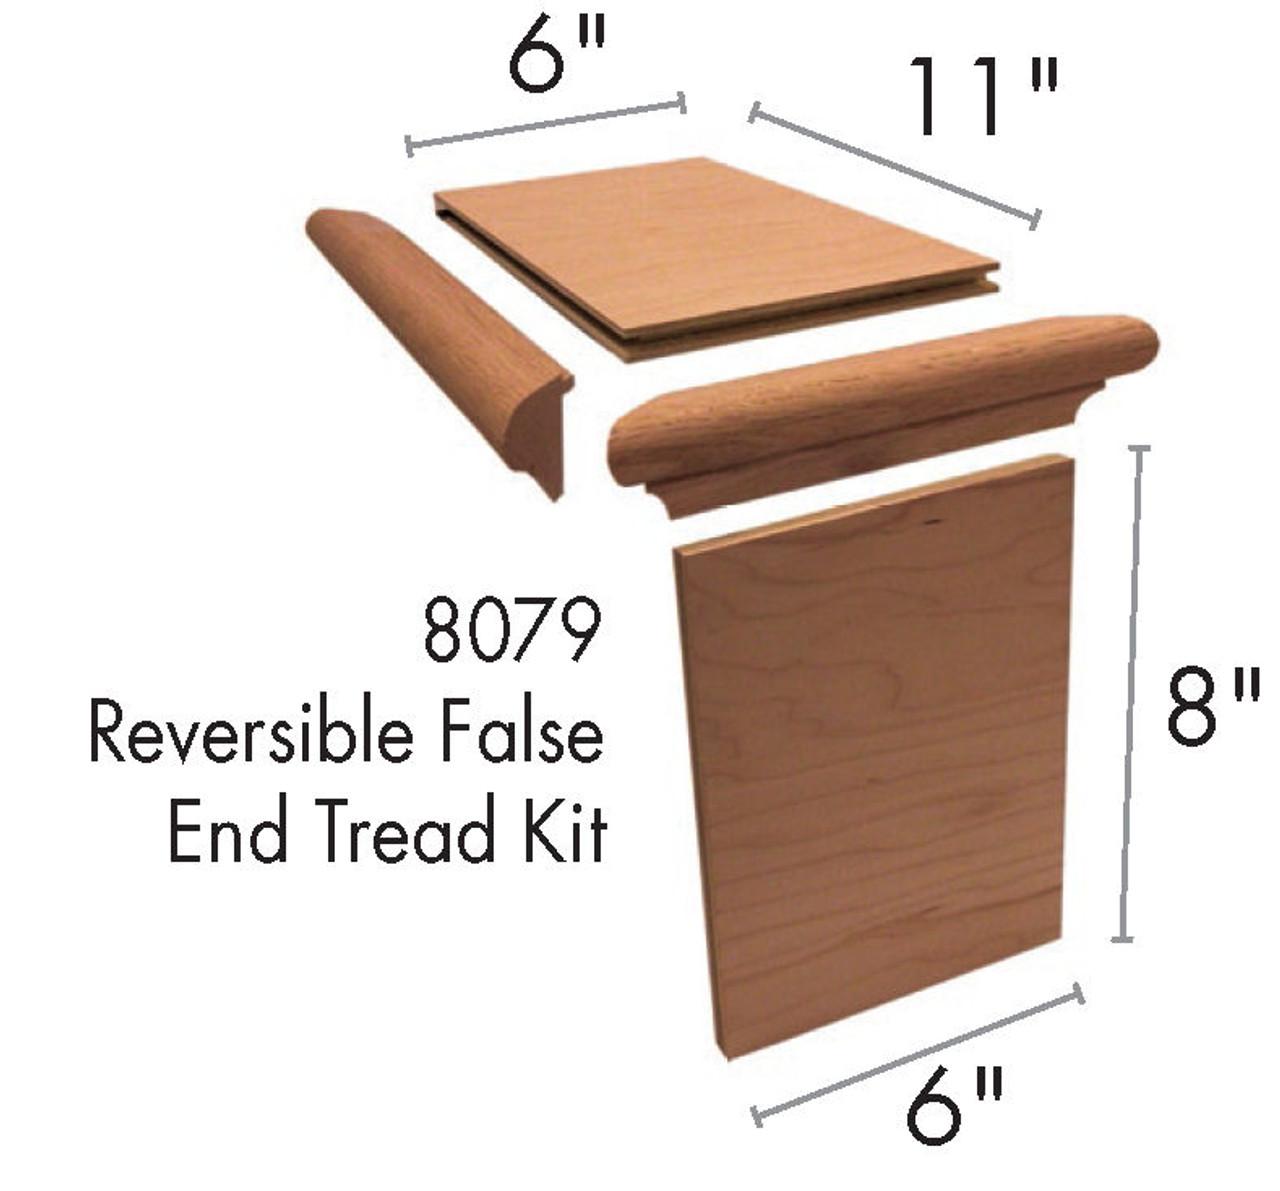 8079 Reversible False Tread Kit Dimensional Information